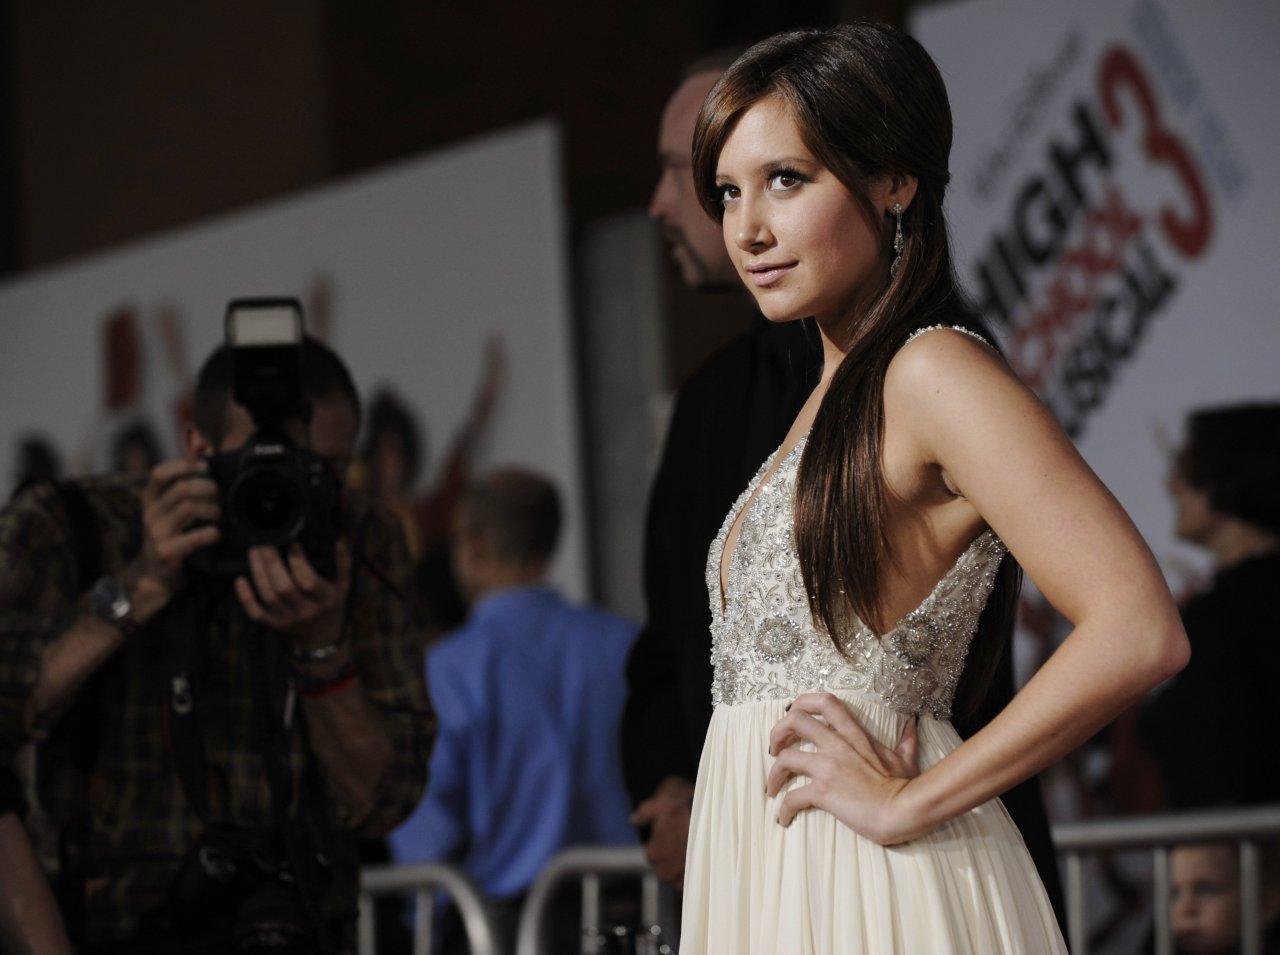 Эшли Тисдейл (Ashley Tisdale), Люди за кадром: фото, биография